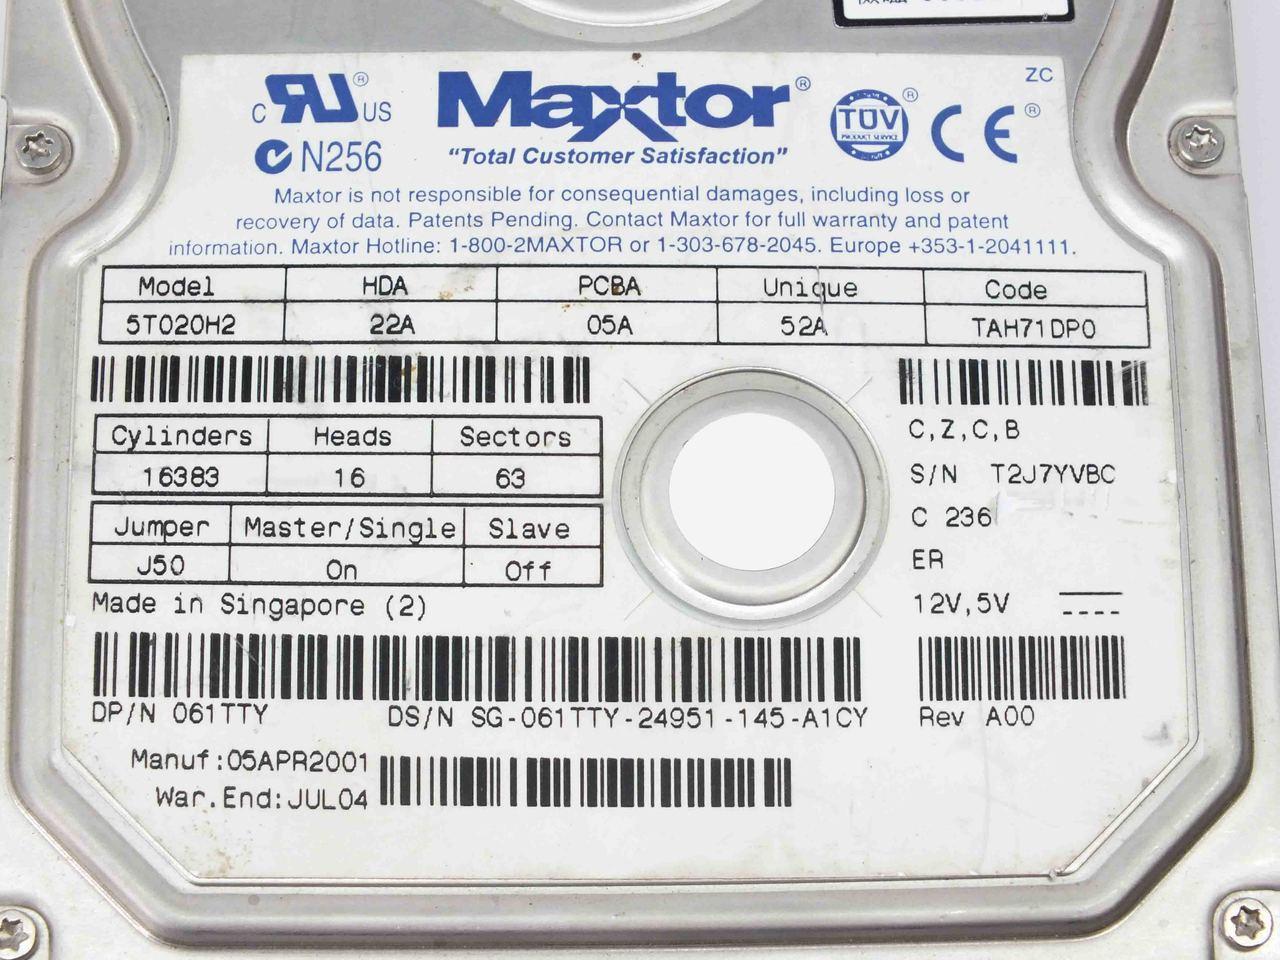 MAXTOR 5T020H2 DELL 061TTY HARD DRIVE